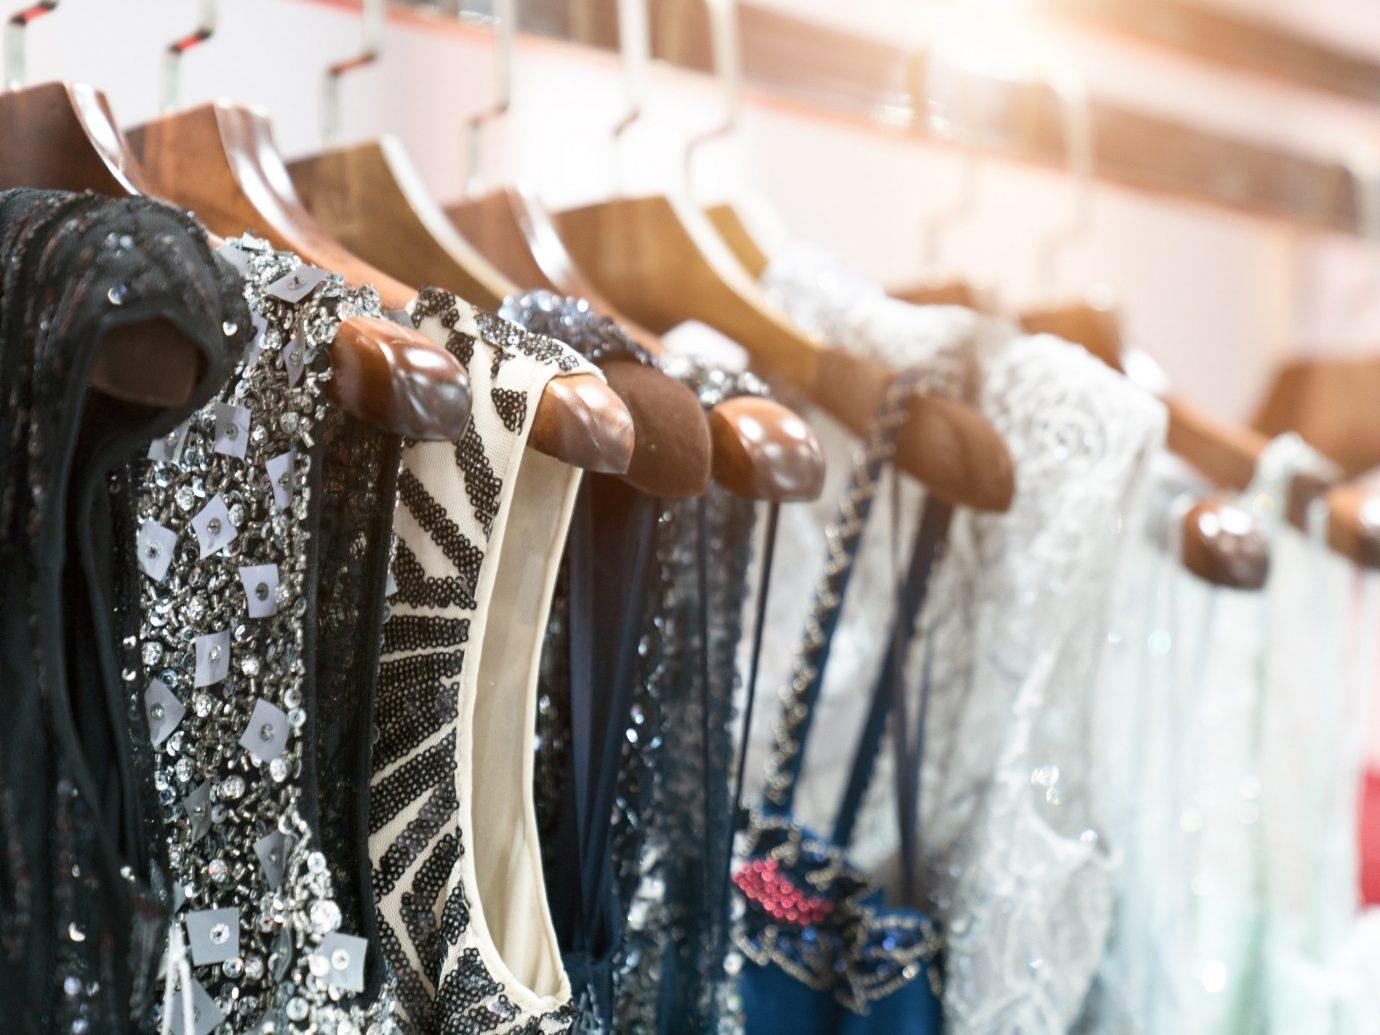 Style + Design Travel Tips Boutique fashion outerwear textile Winter clothes hanger